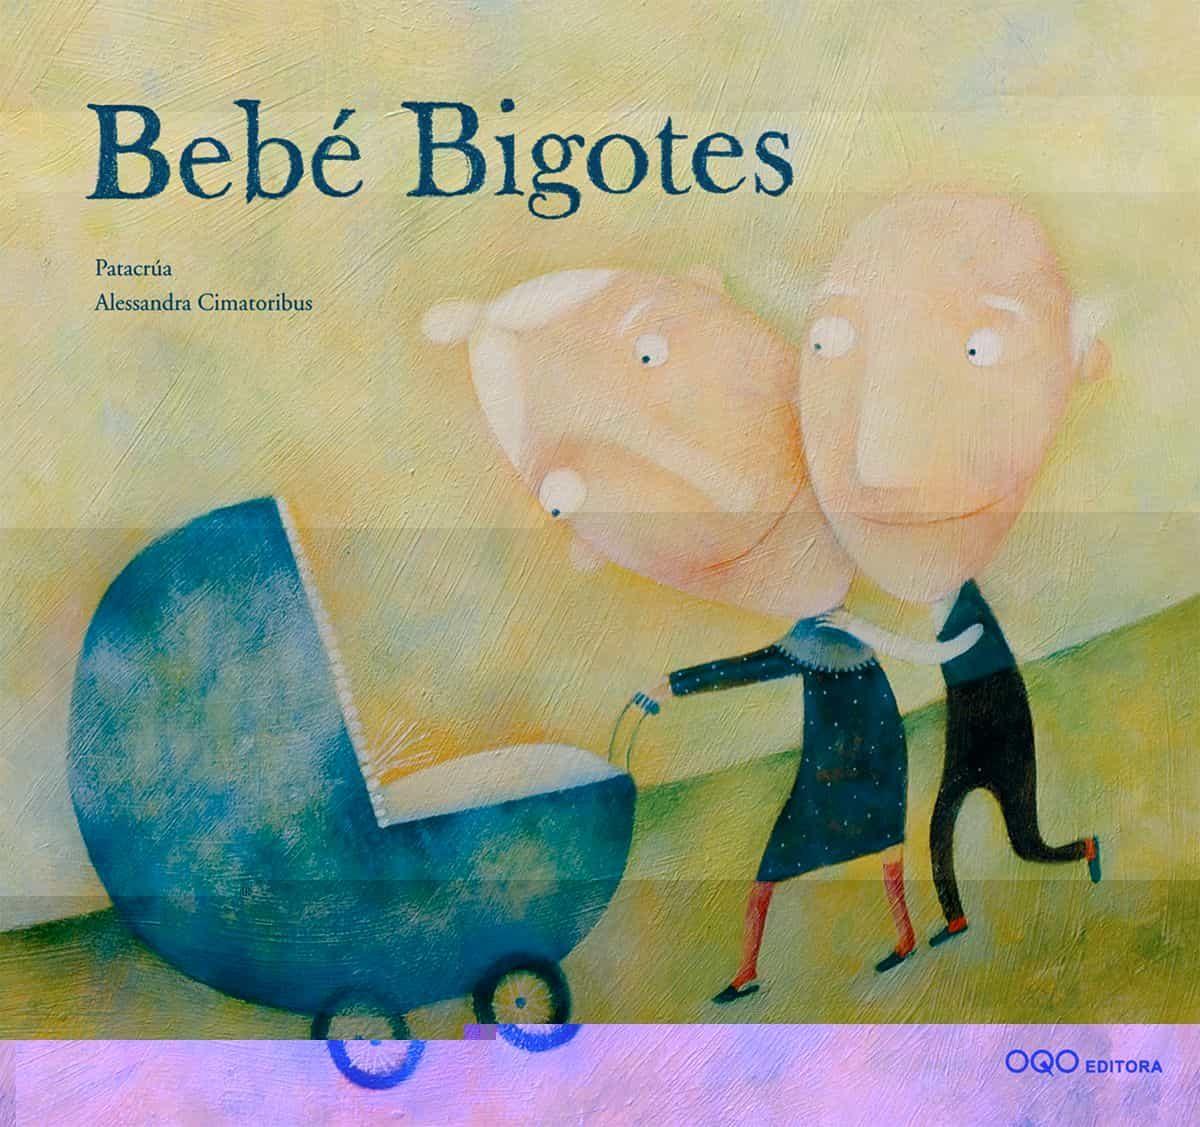 Bebe Bigotes por Patacrua;                                                           Alessandra Cimatoribus epub